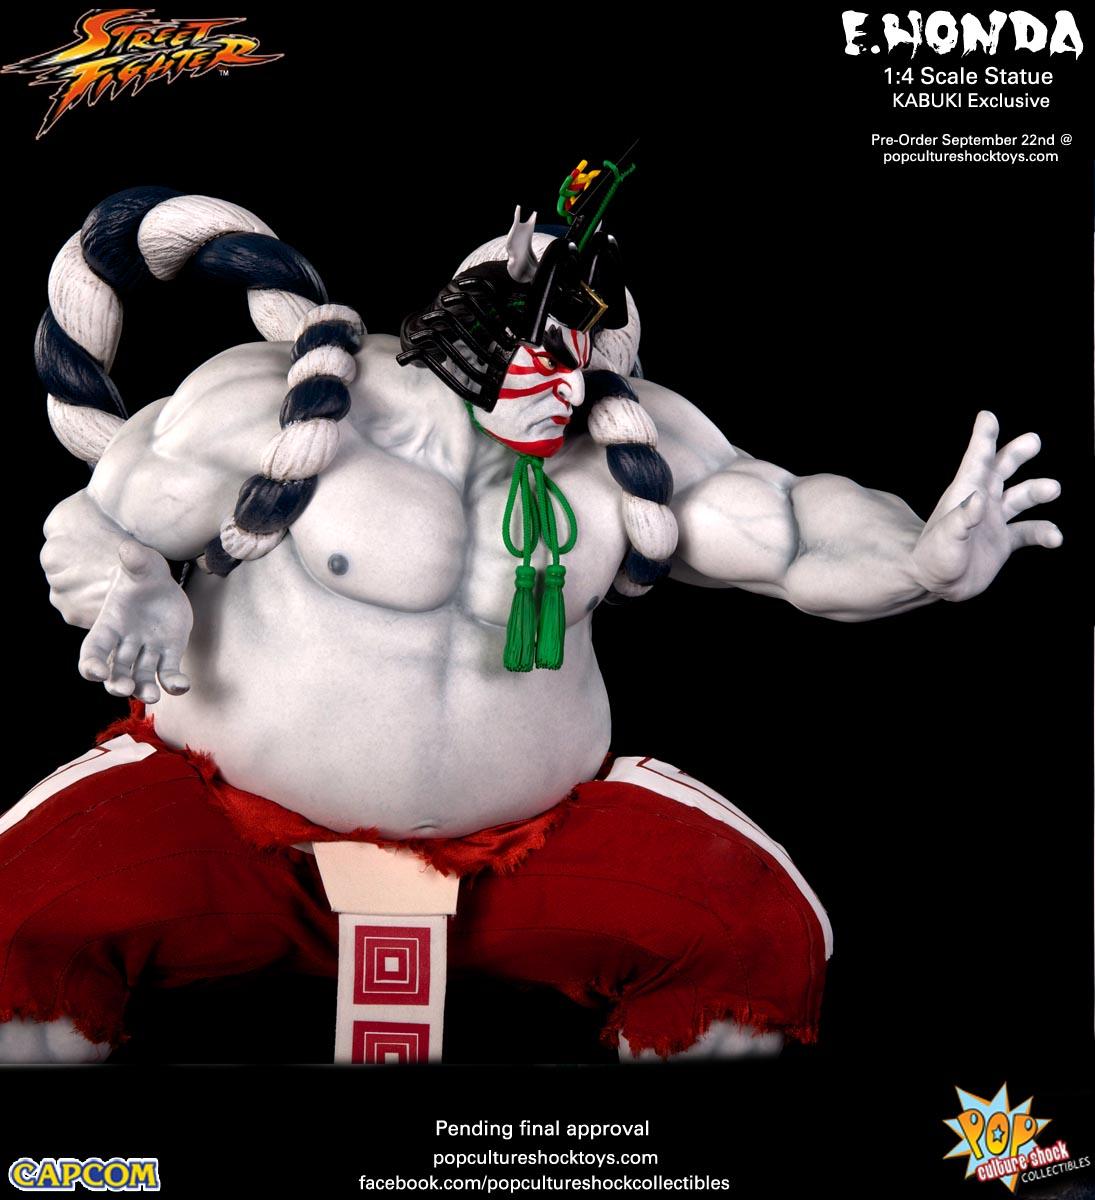 [Pop Culture Shock] Street Fighter: E. Honda 1/4 Statue - Página 3 Street-Fighter-E.-Honda-Kabuki-Statue-021